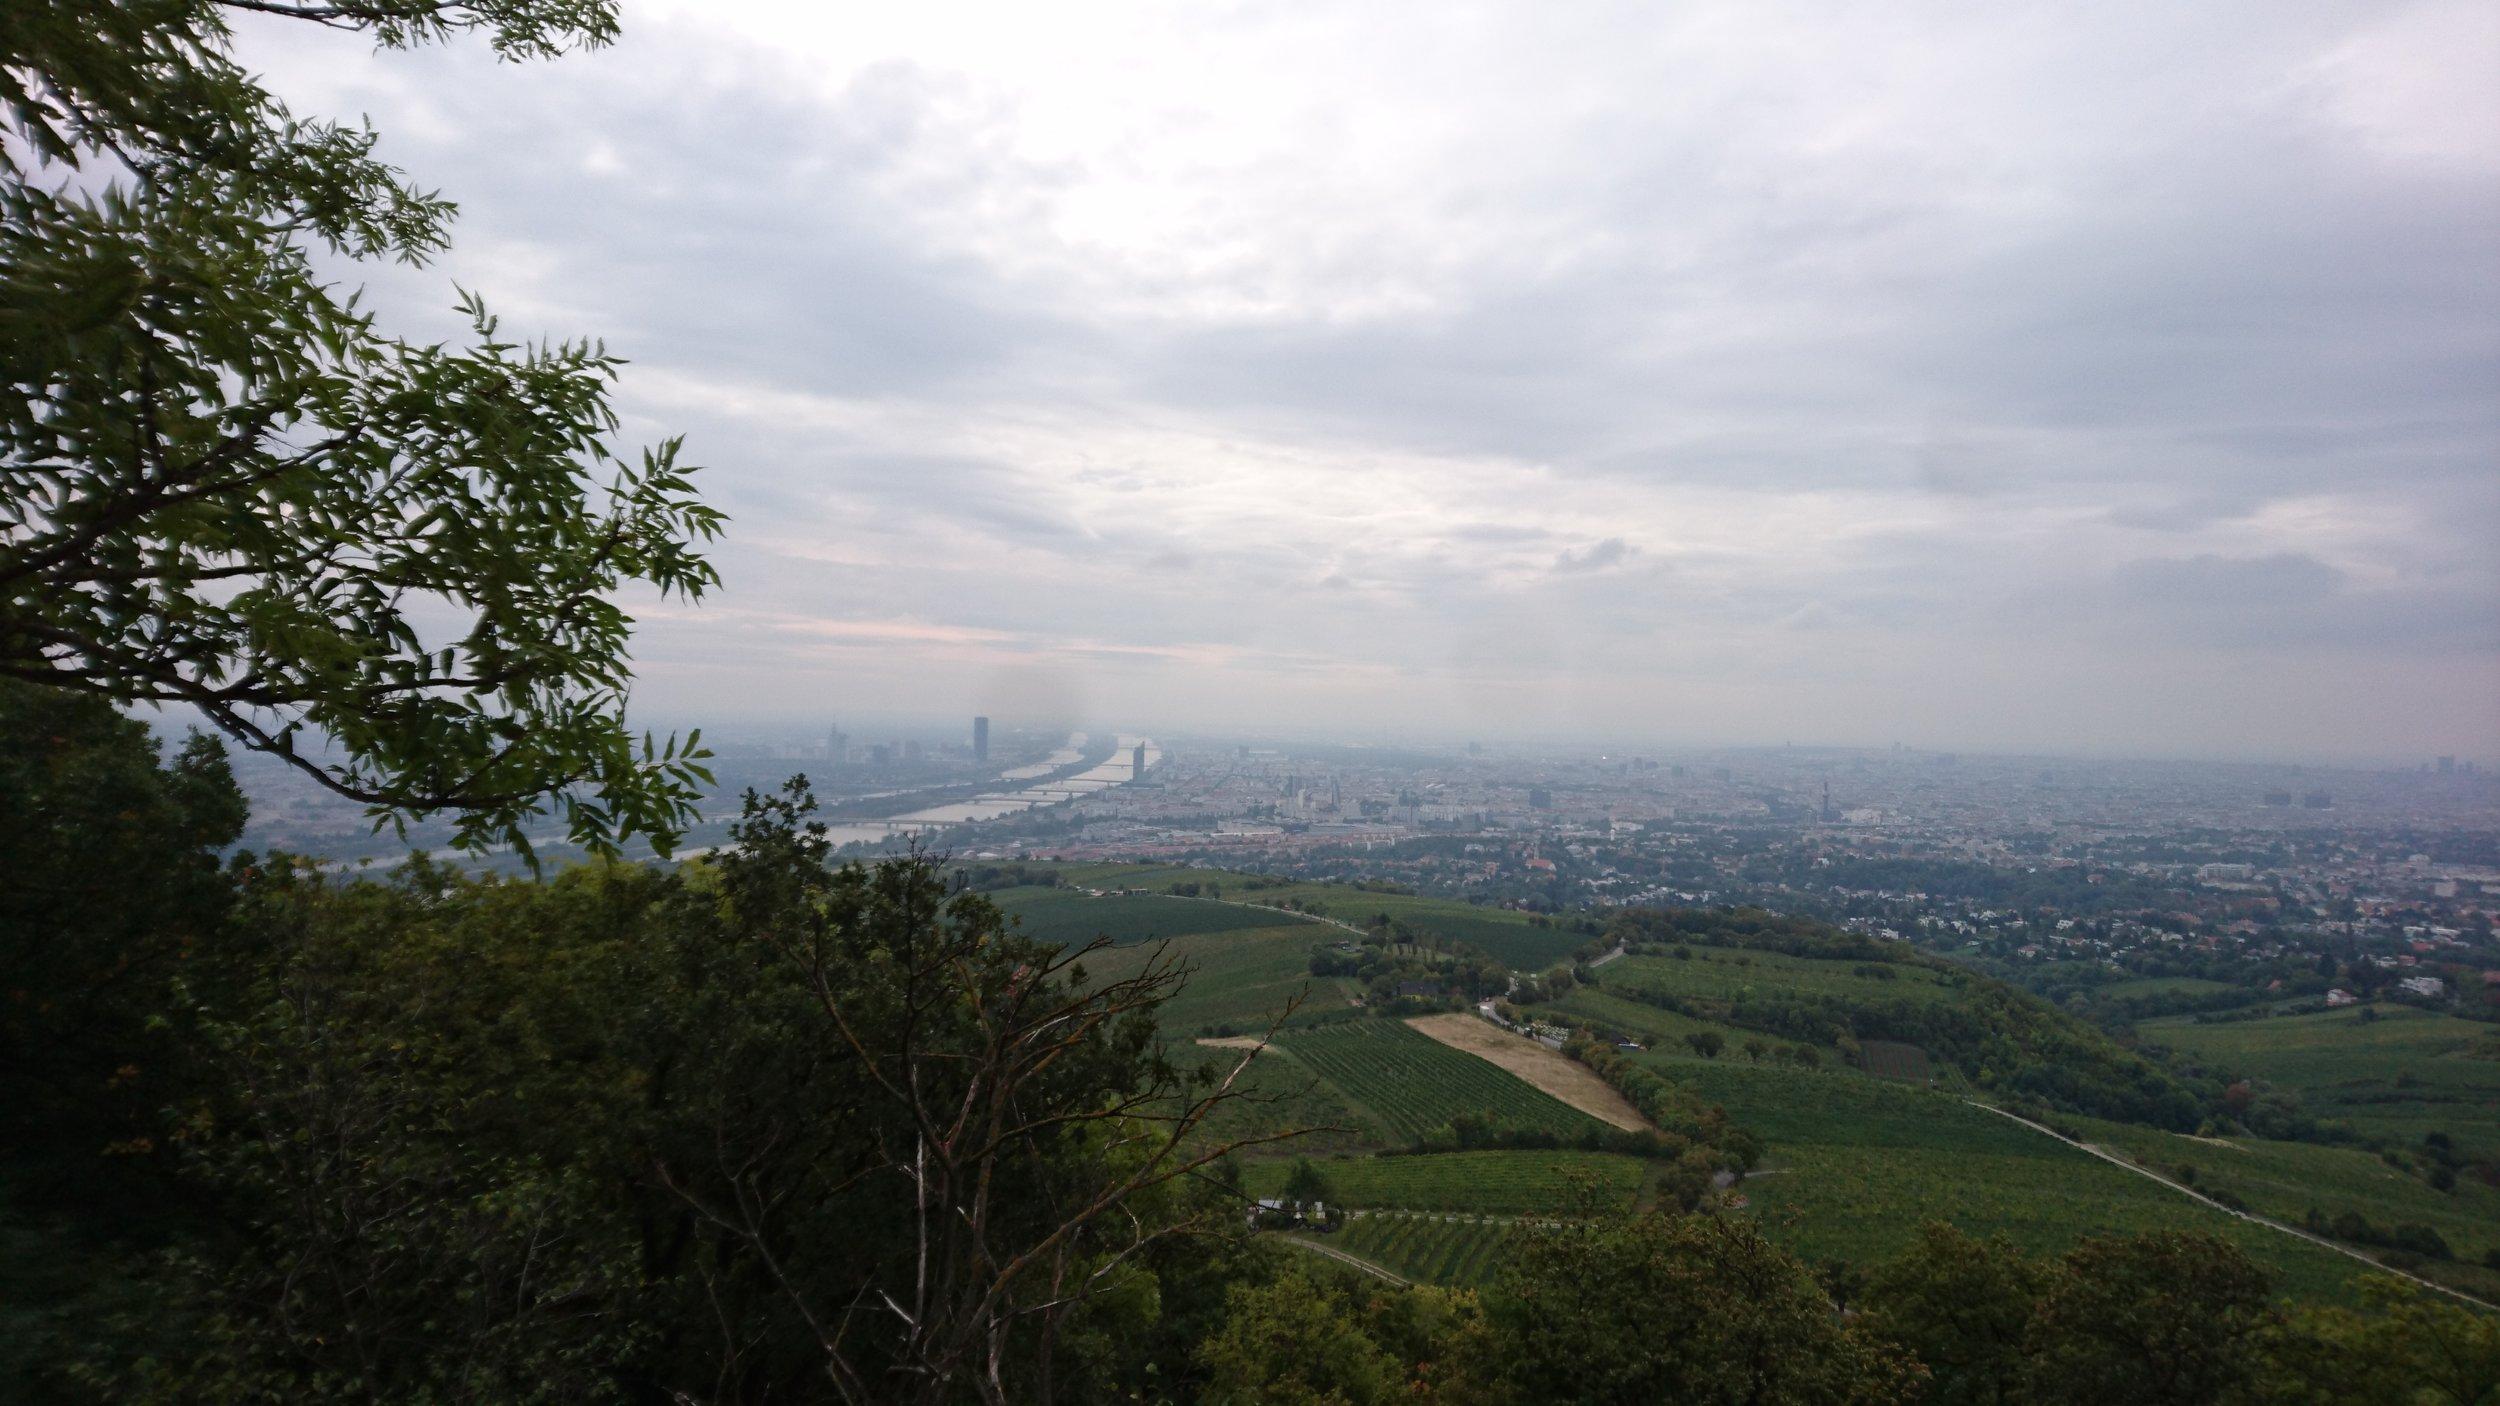 4c-Wandertag-2017-18-001.JPG